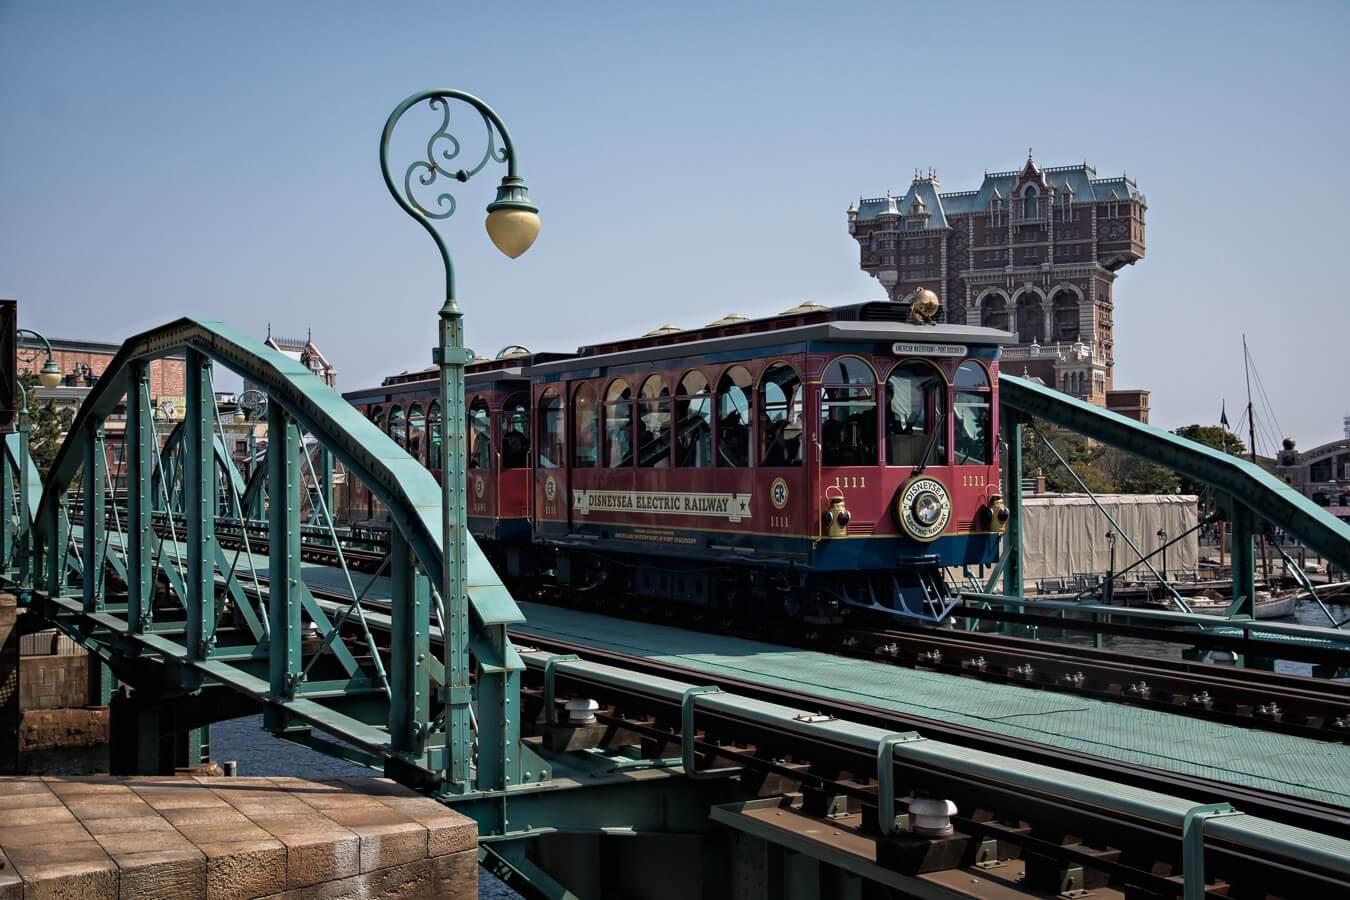 Monorail, Tokyo Disney Sea, Japan - Photo by Zed Sindelar of CuriousZed Photography